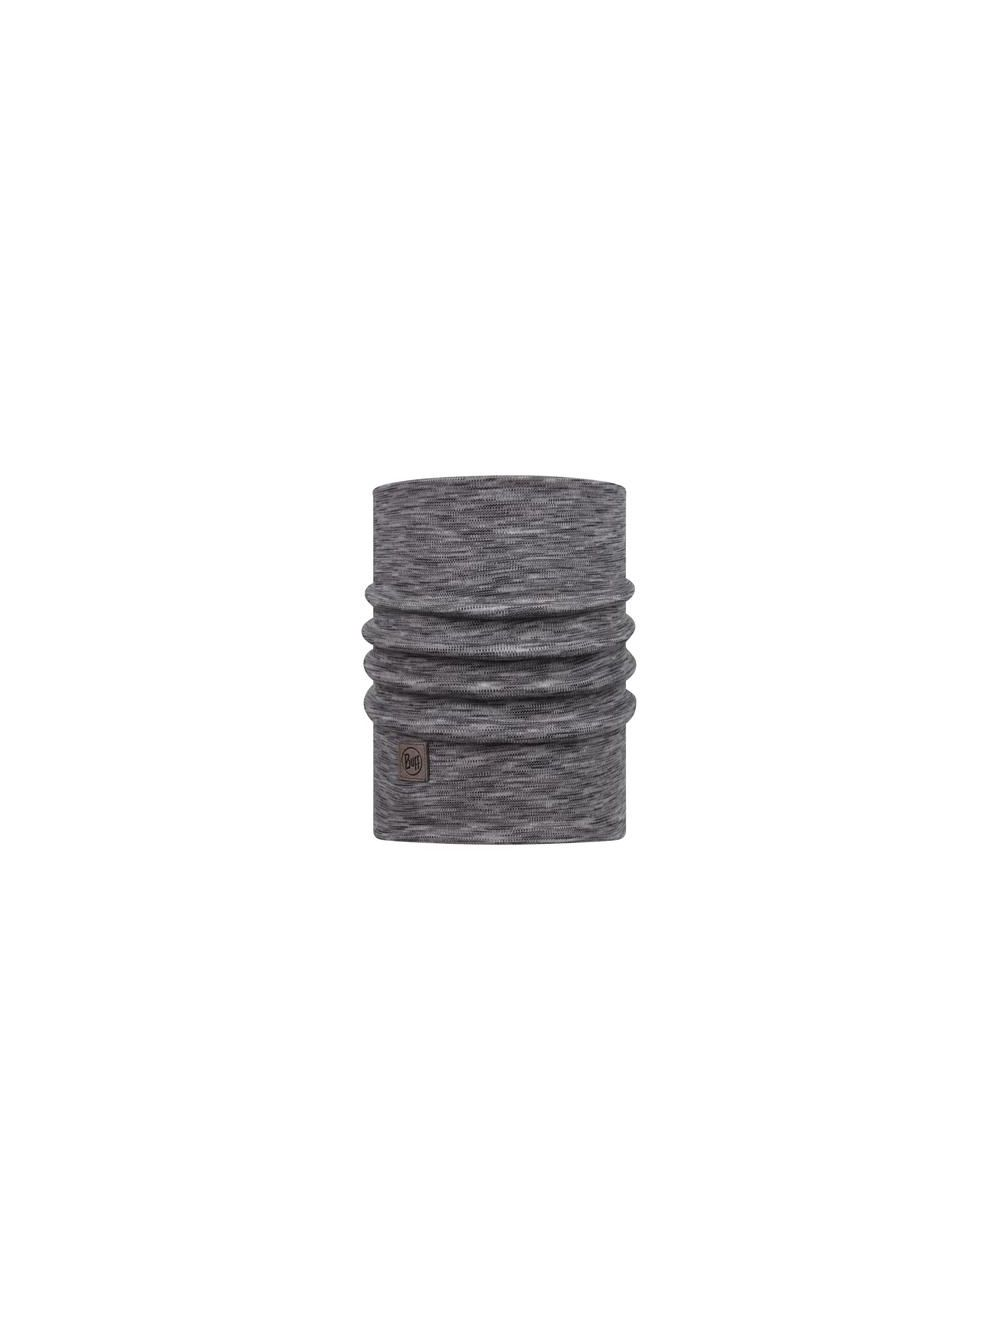 BUFF Komin HEAVYWEIGHT MERINO WOOL fog grey multi stripes